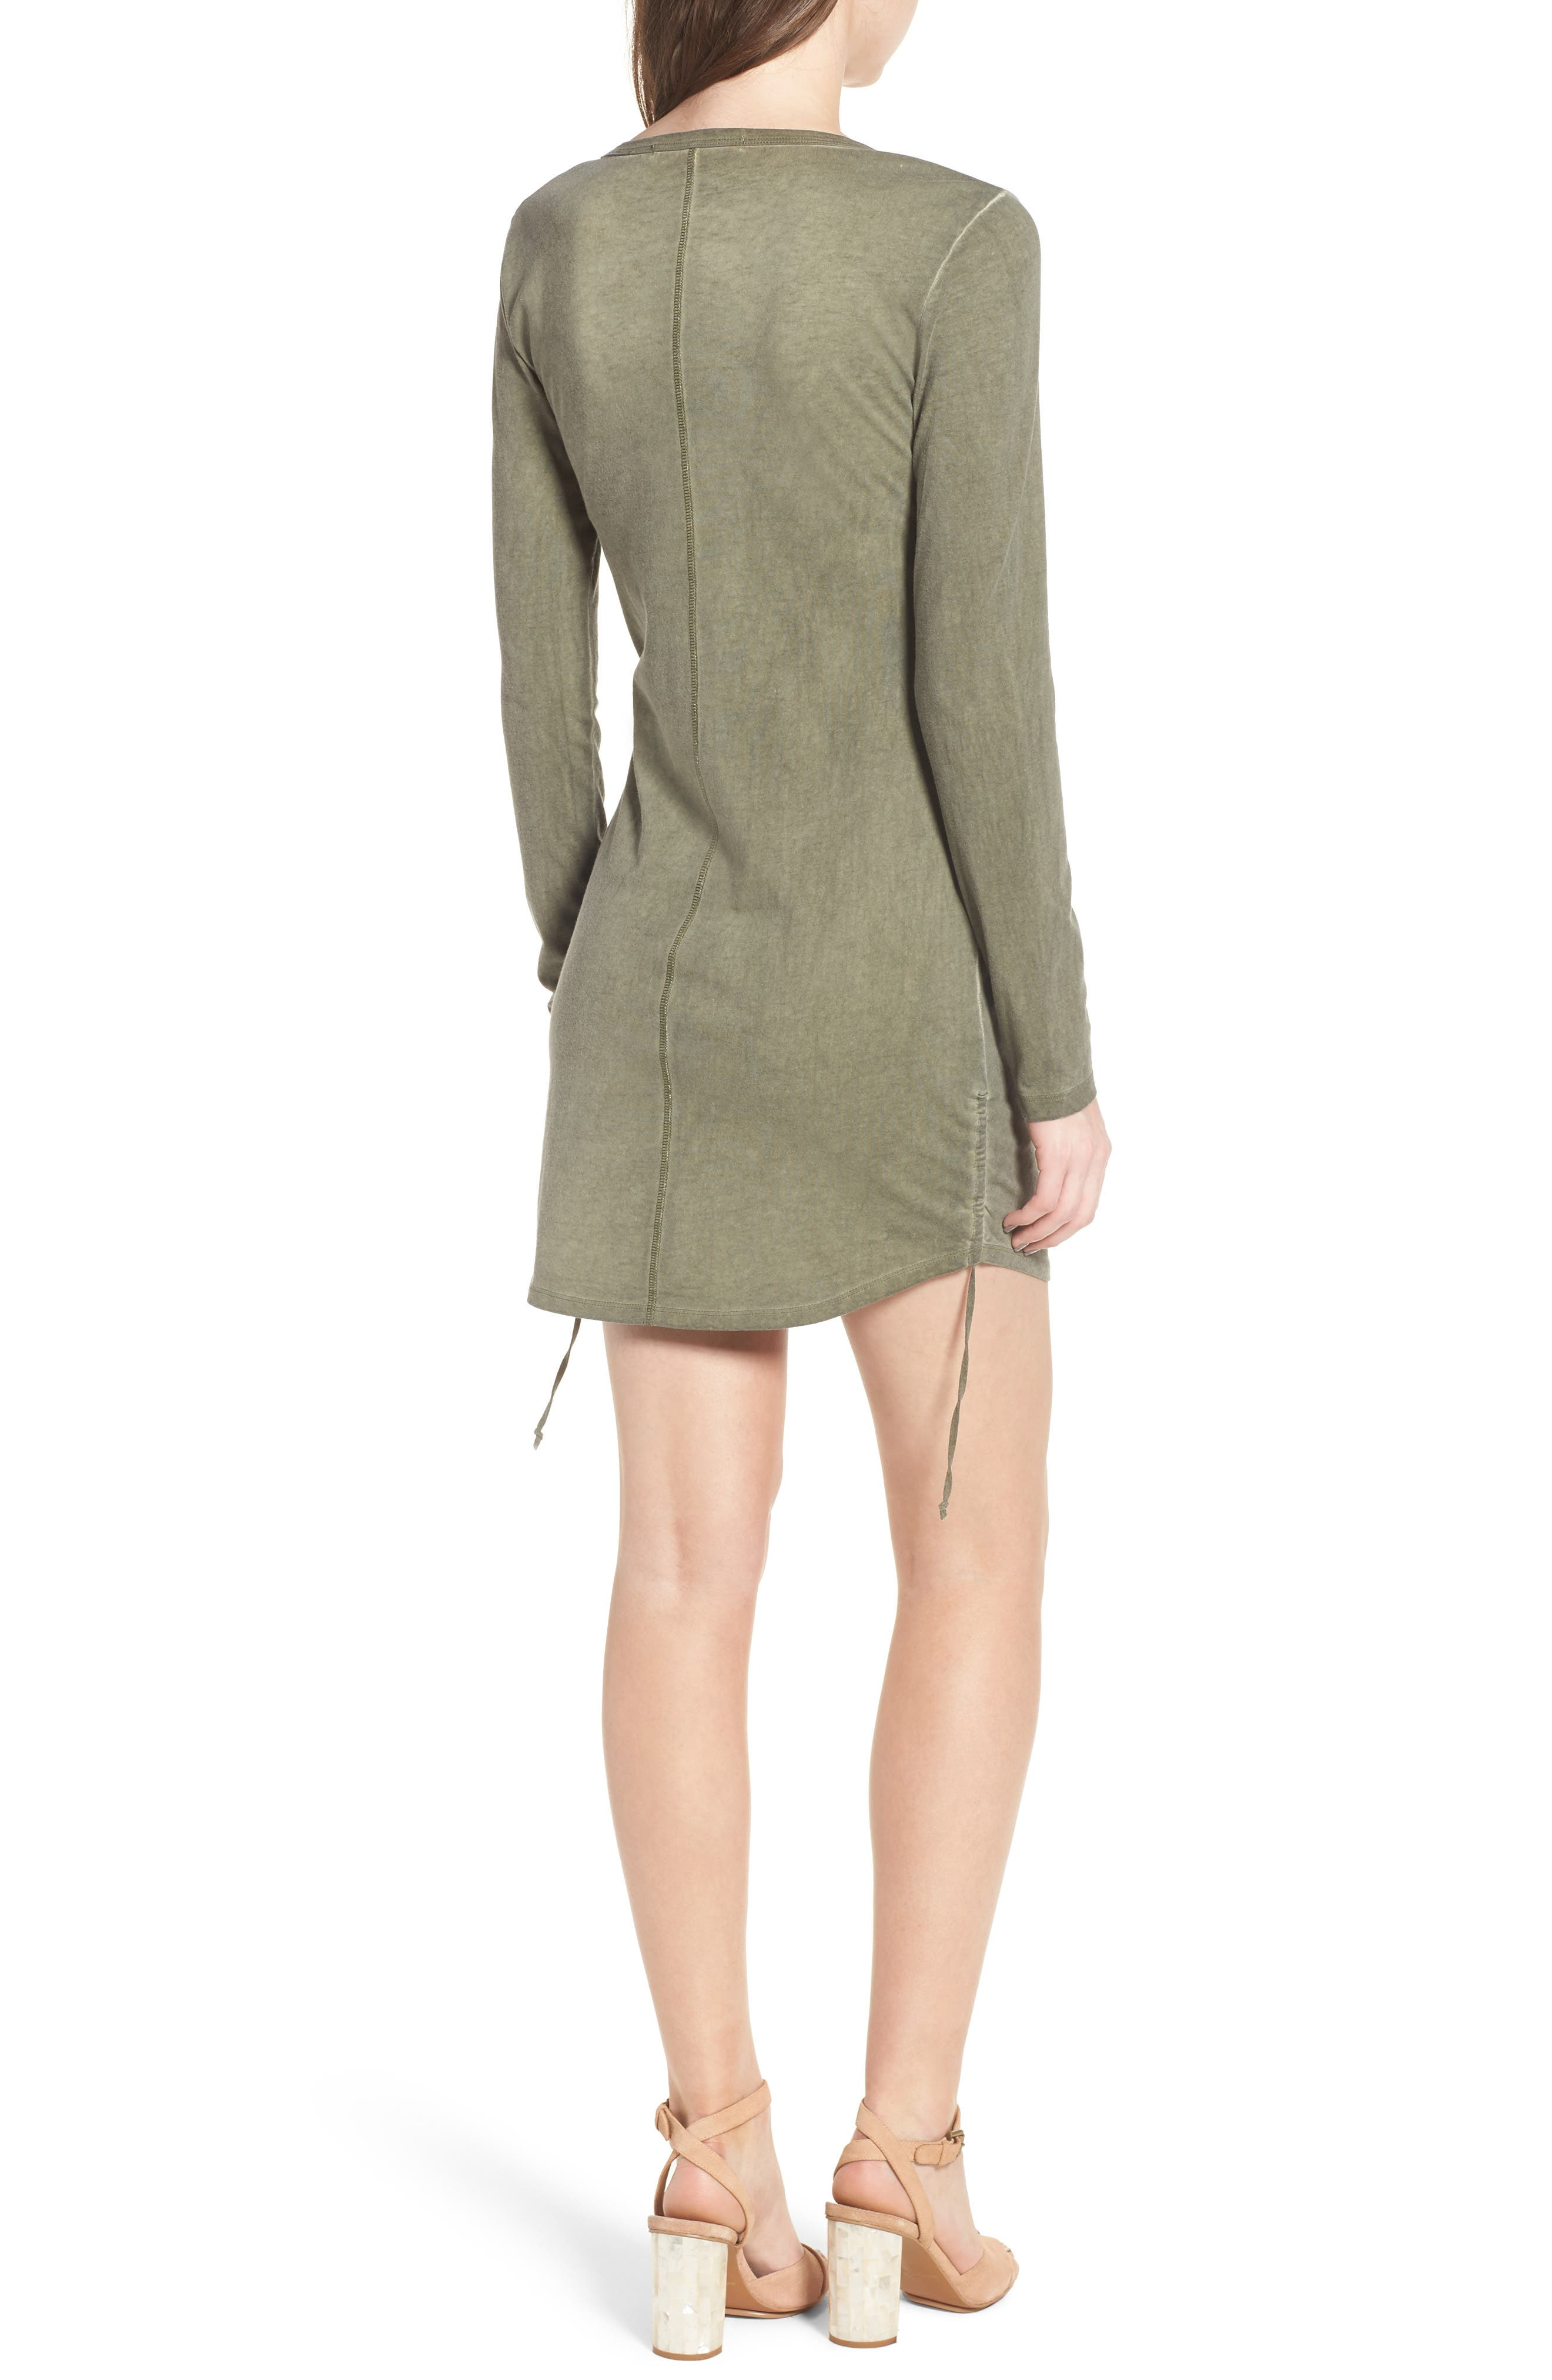 Scoop Neck Body-Con Dress,                             Alternate thumbnail 2, color,                             304